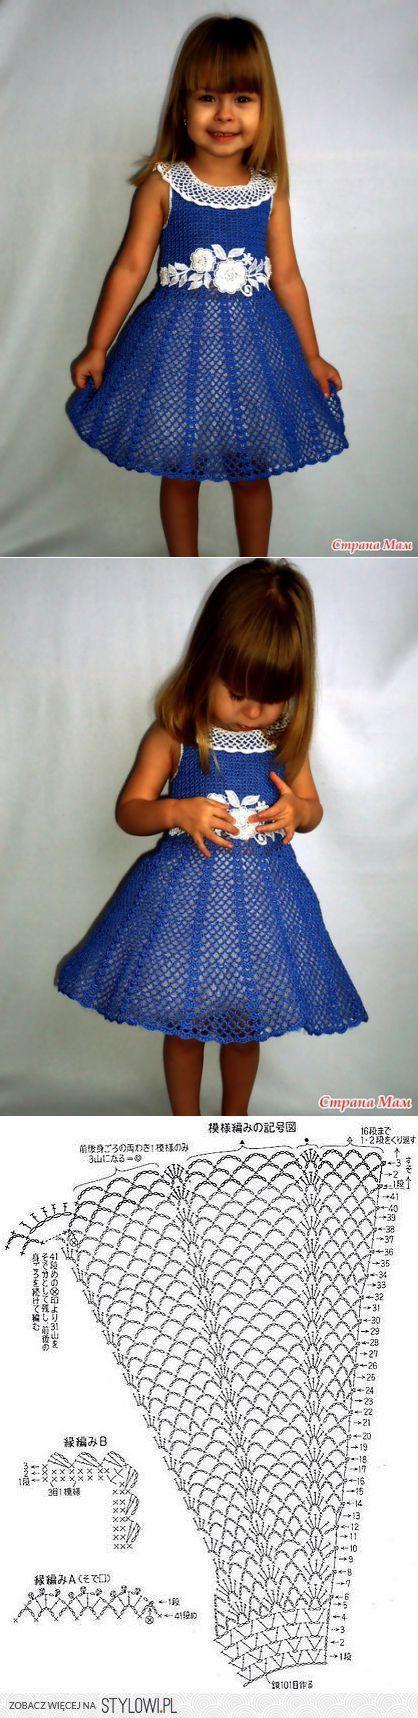 vestido nina crochet-patron-grafico-esquema-otakulandia.es (19)